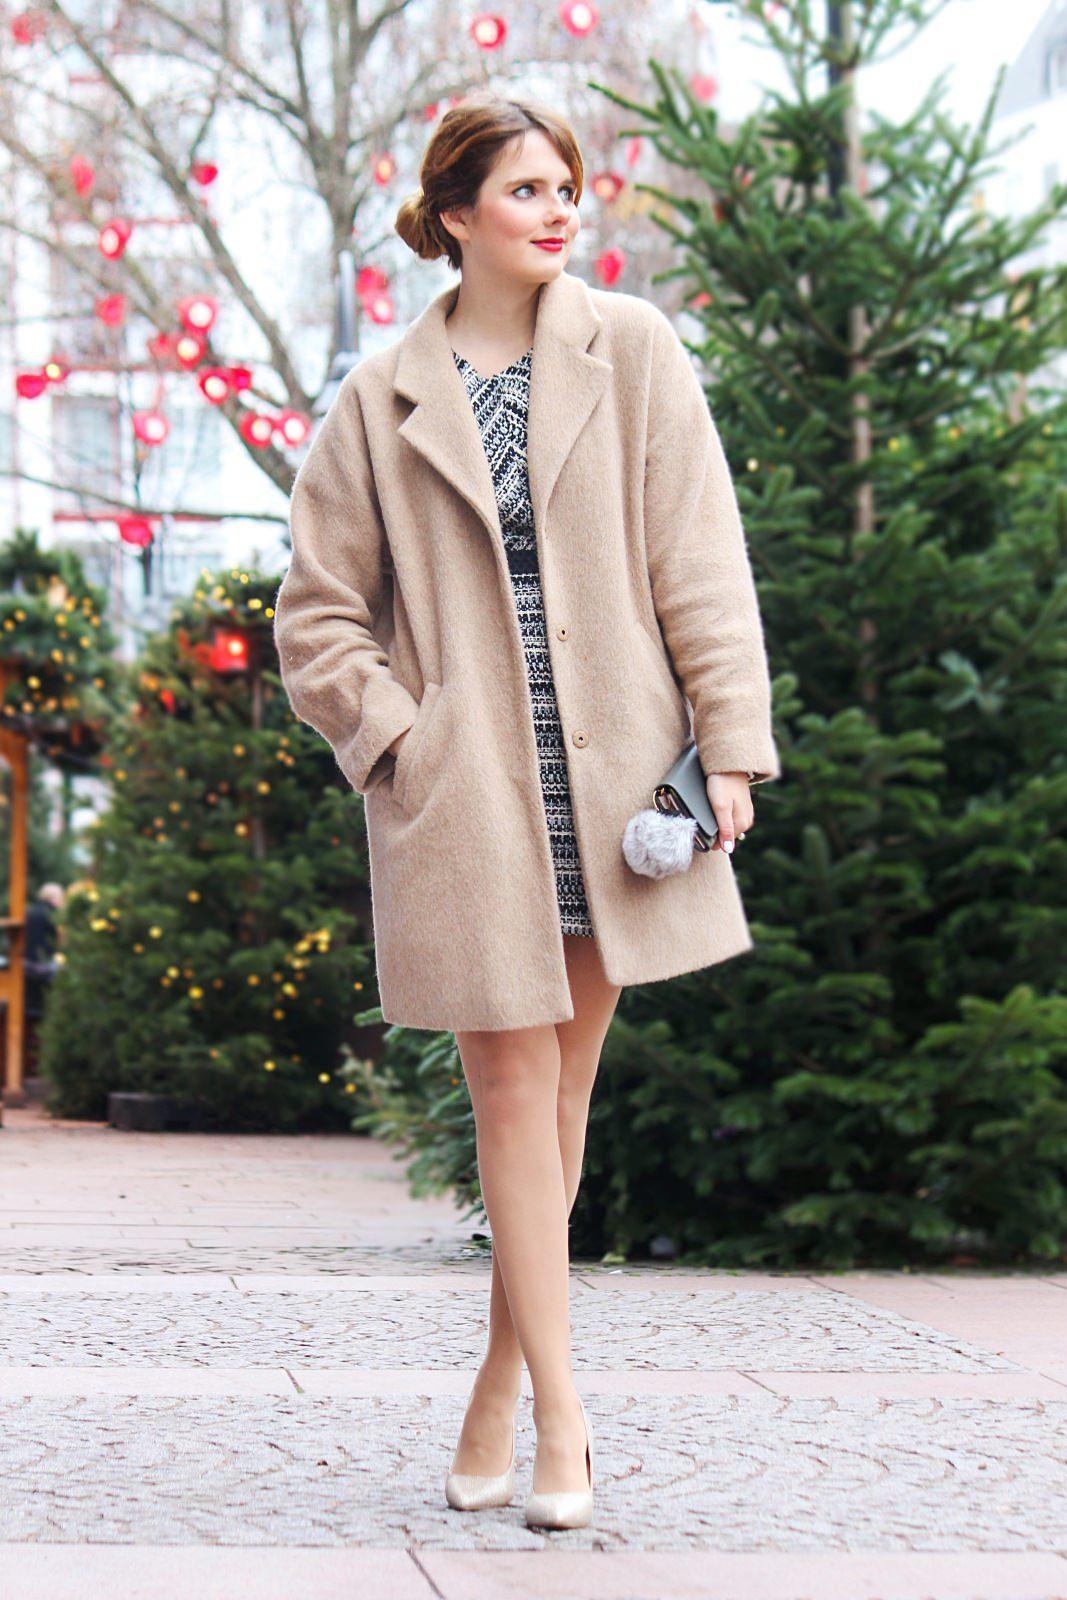 desbelleschoses-fashion-blog-köln-weihnachtsoutfit-2015-klassisch-schick-mit-camel-mantel-minikleid 1